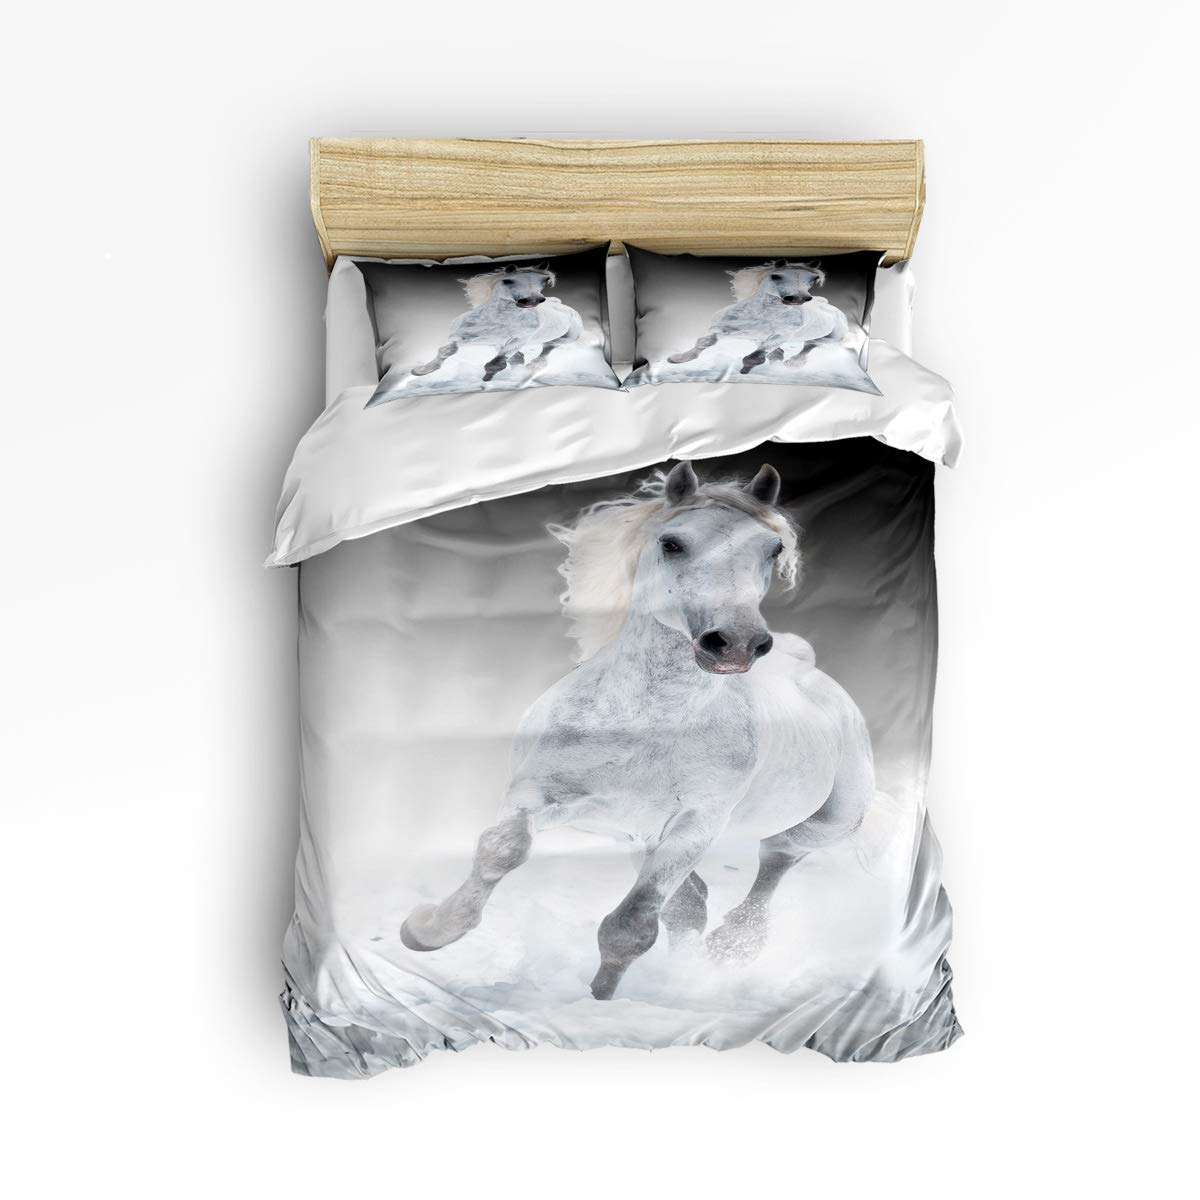 YEHO アートギャラリー フルサイズ 3ピース かわいい羽毛布団カバーセット ツイルフラシ天 ソフト寝具セット 子供 女の子 男の子用 クールホワイト 馬 動物 パターン 掛け布団カバー 1 枚と枕カバー 2 枚入り B07KT7LFRZ